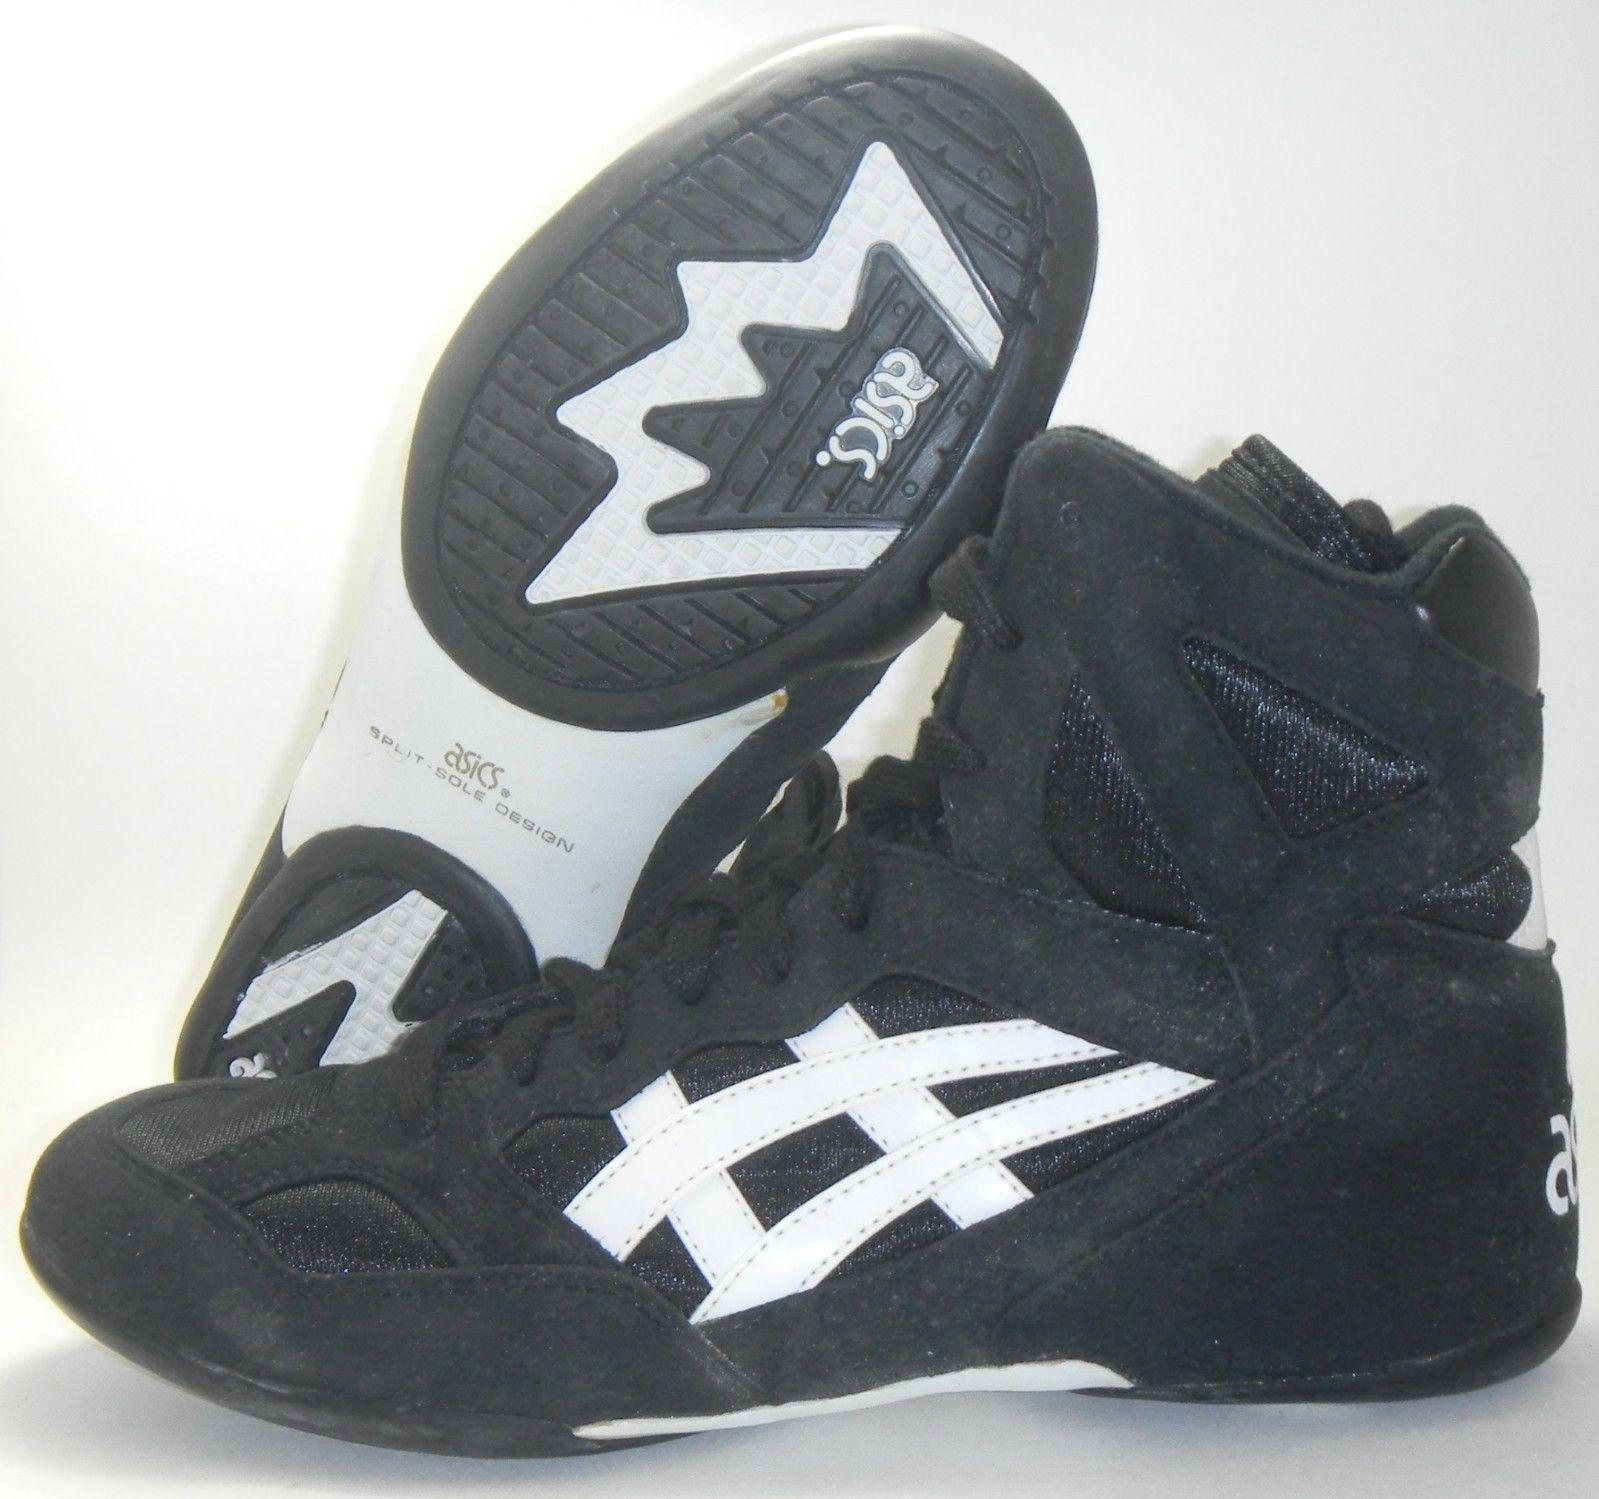 16e480ab0bdf Vintage asics split second 3 wrestling shoes size 8 black white ...